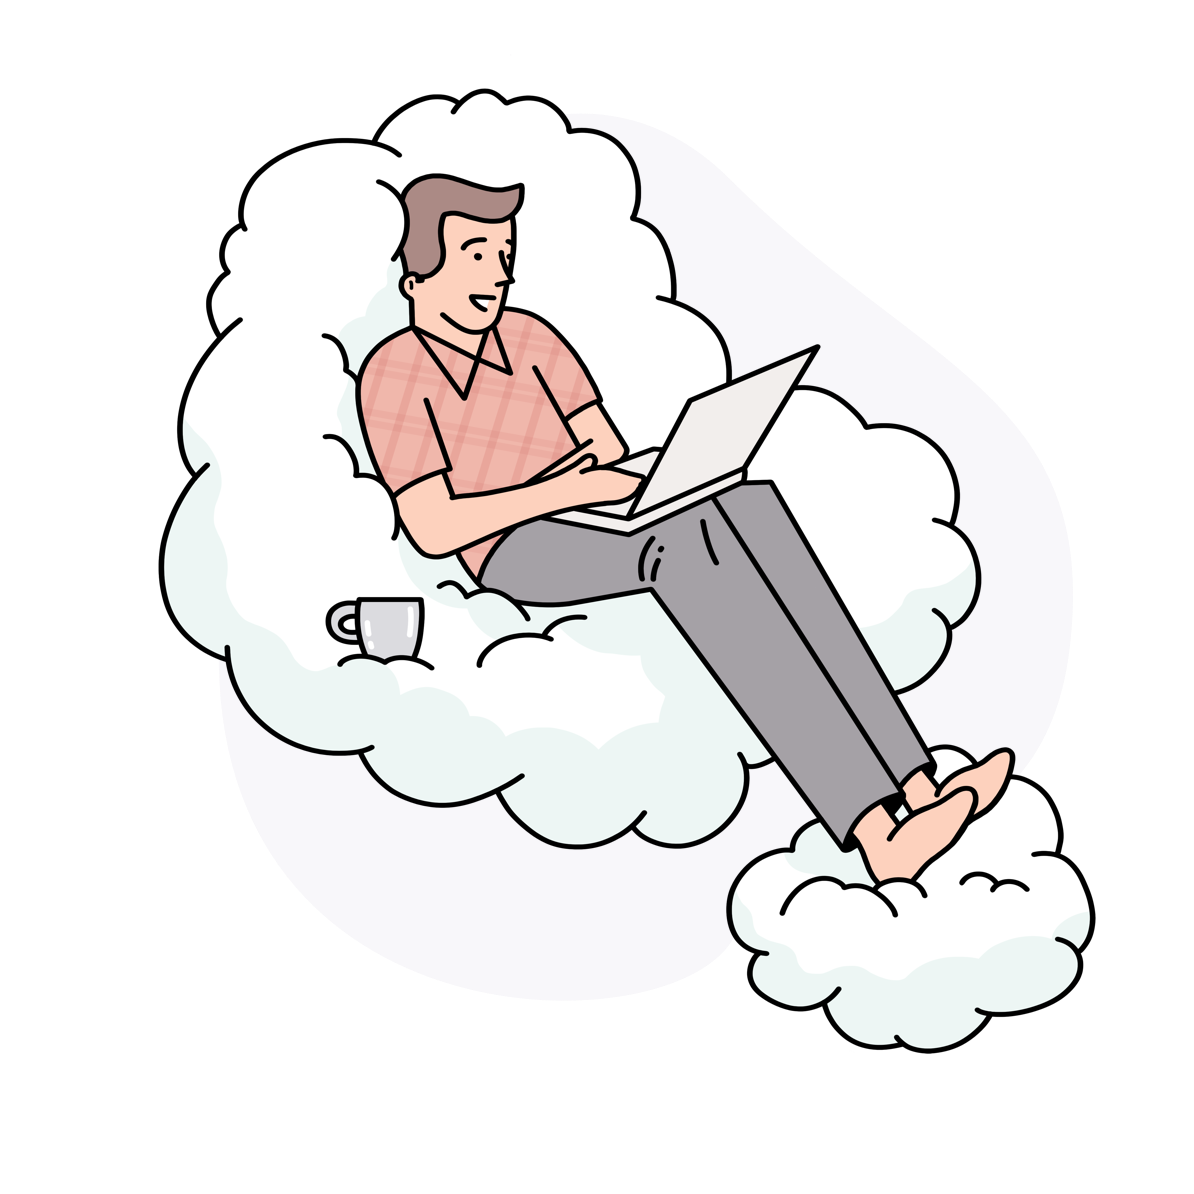 img_cloud_guy